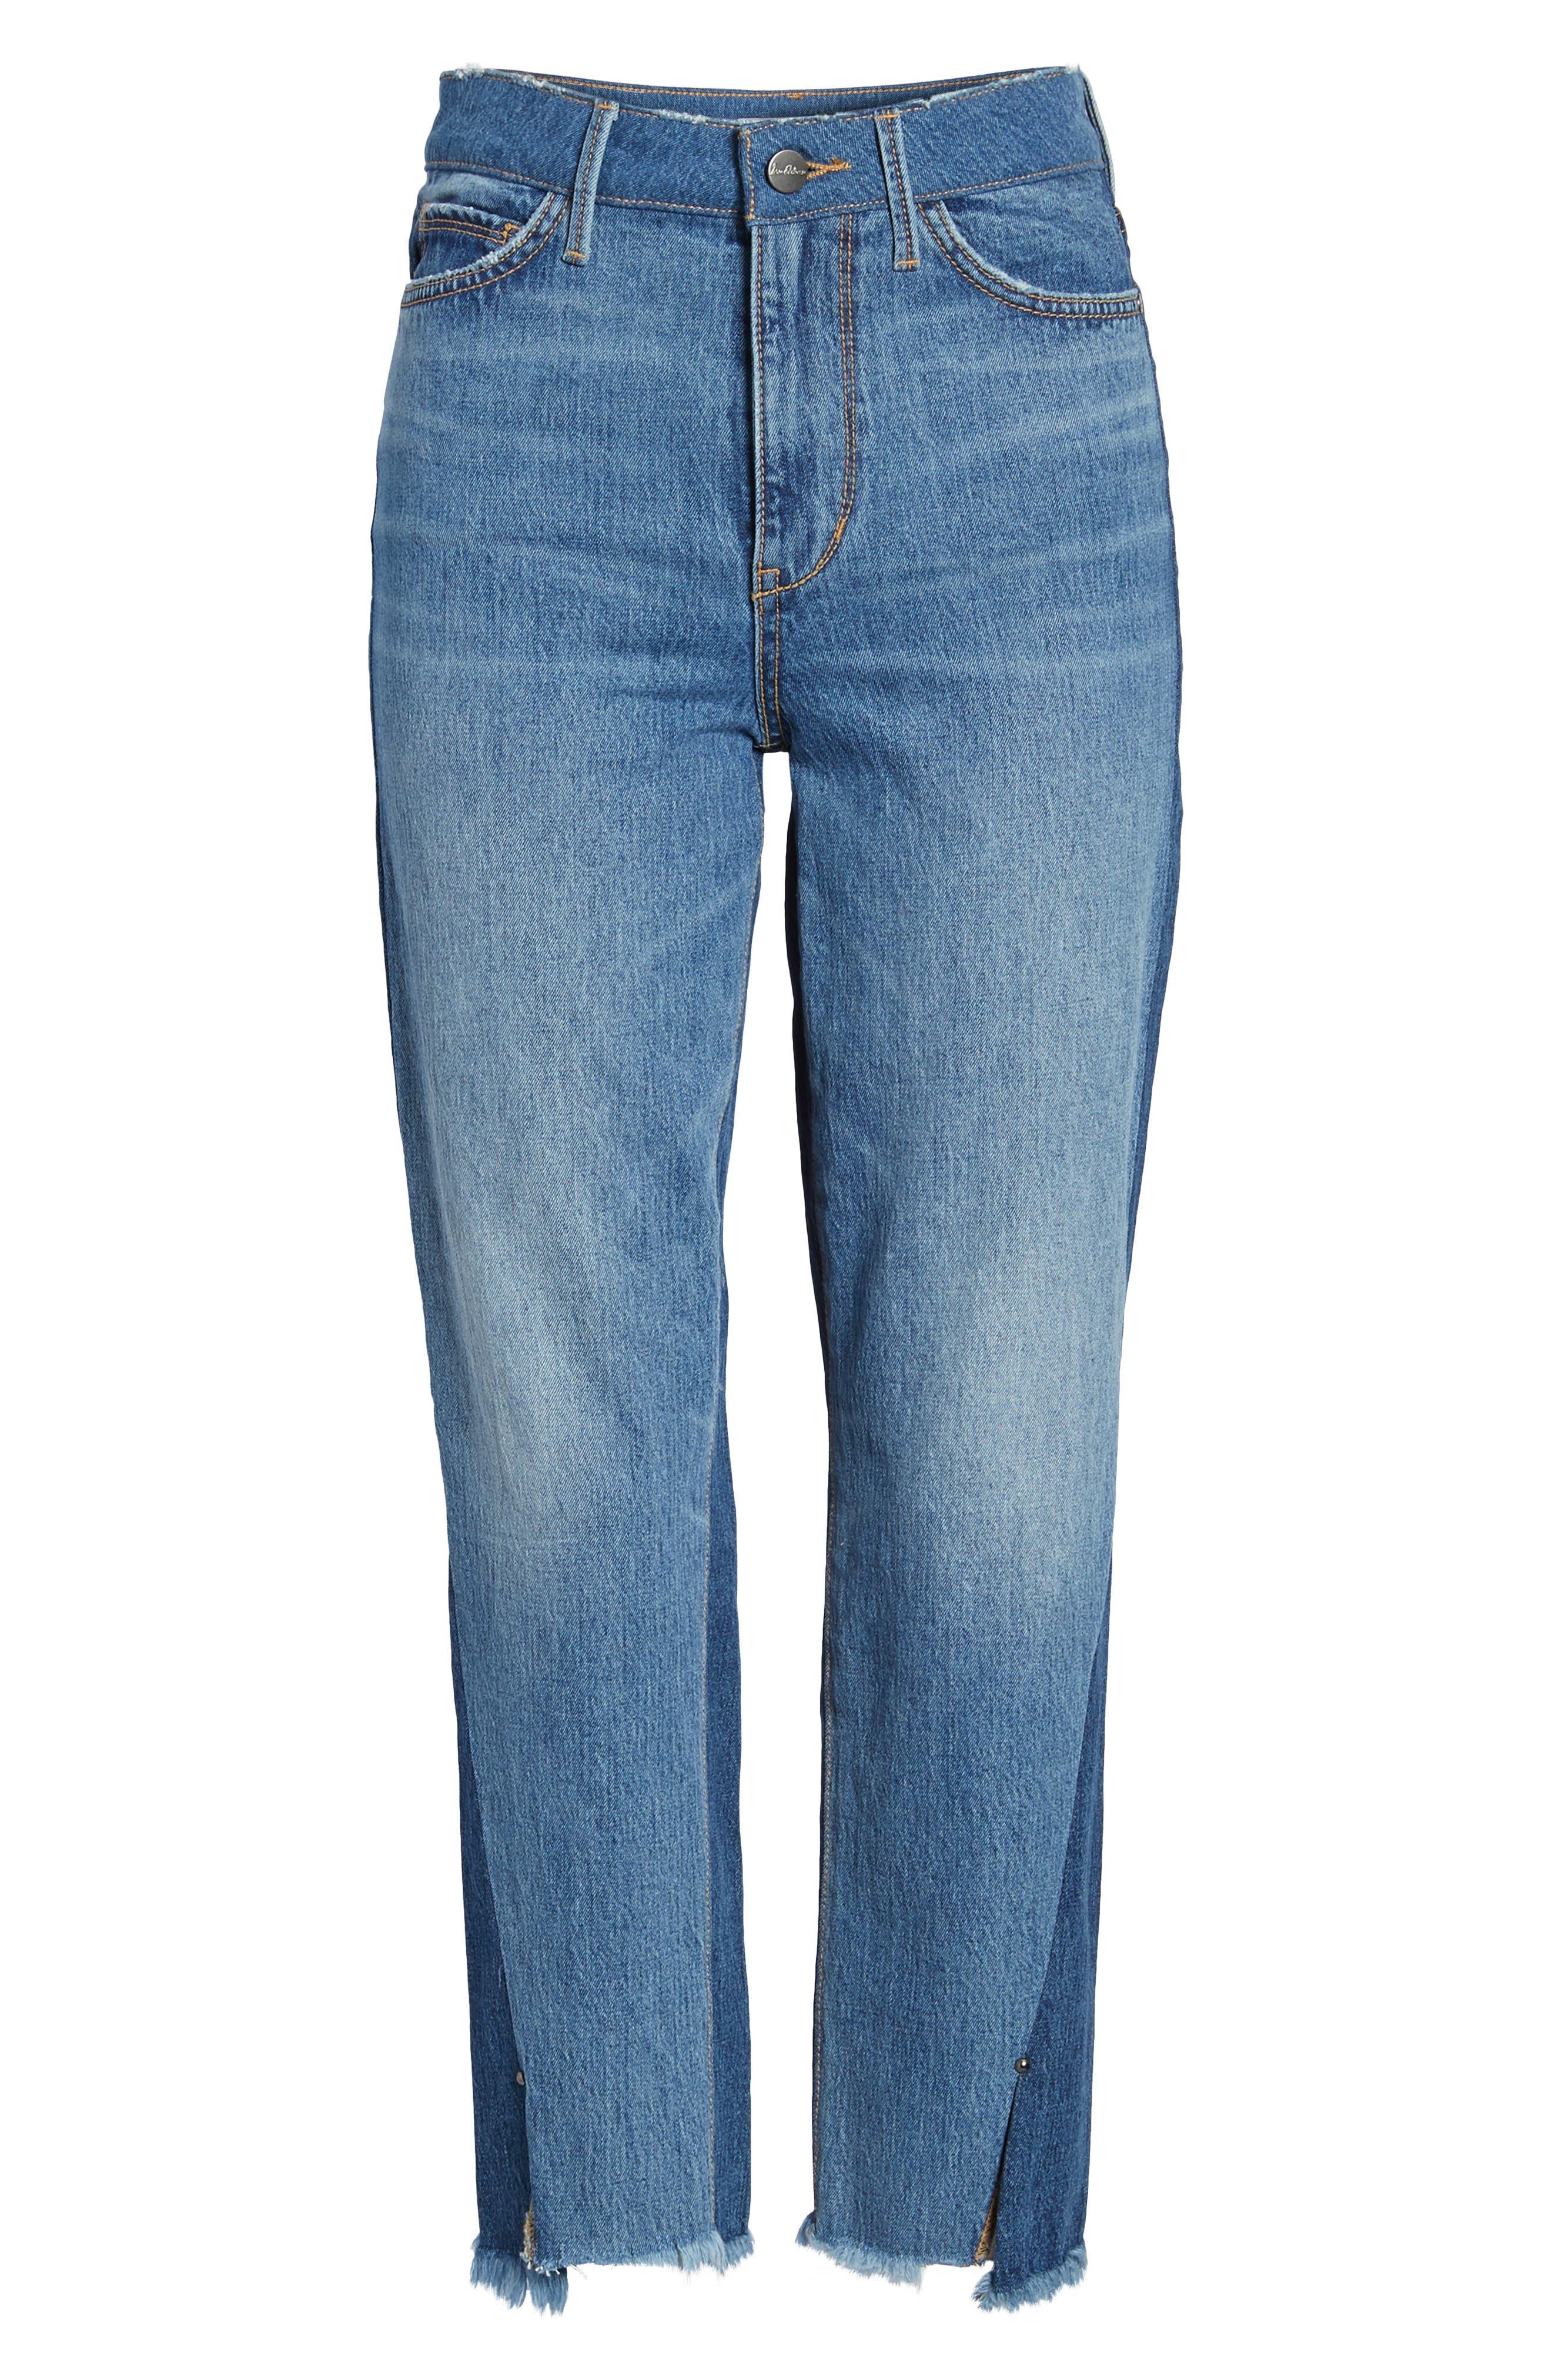 The Mary Jane Fringe Hem Contrast Jeans,                             Alternate thumbnail 6, color,                             410